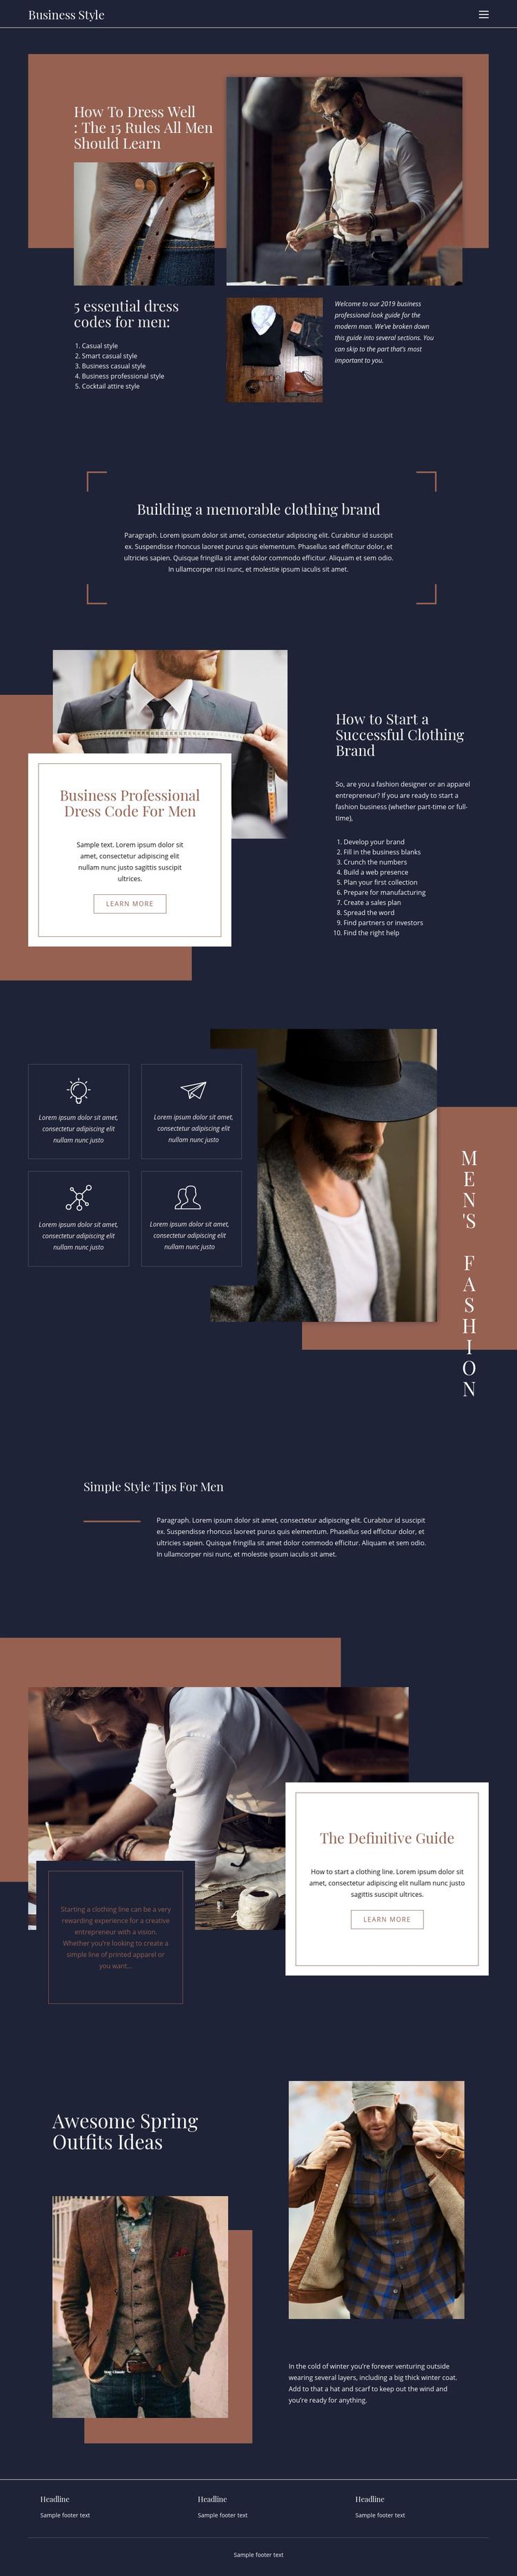 Winning rules of fashion Homepage Design